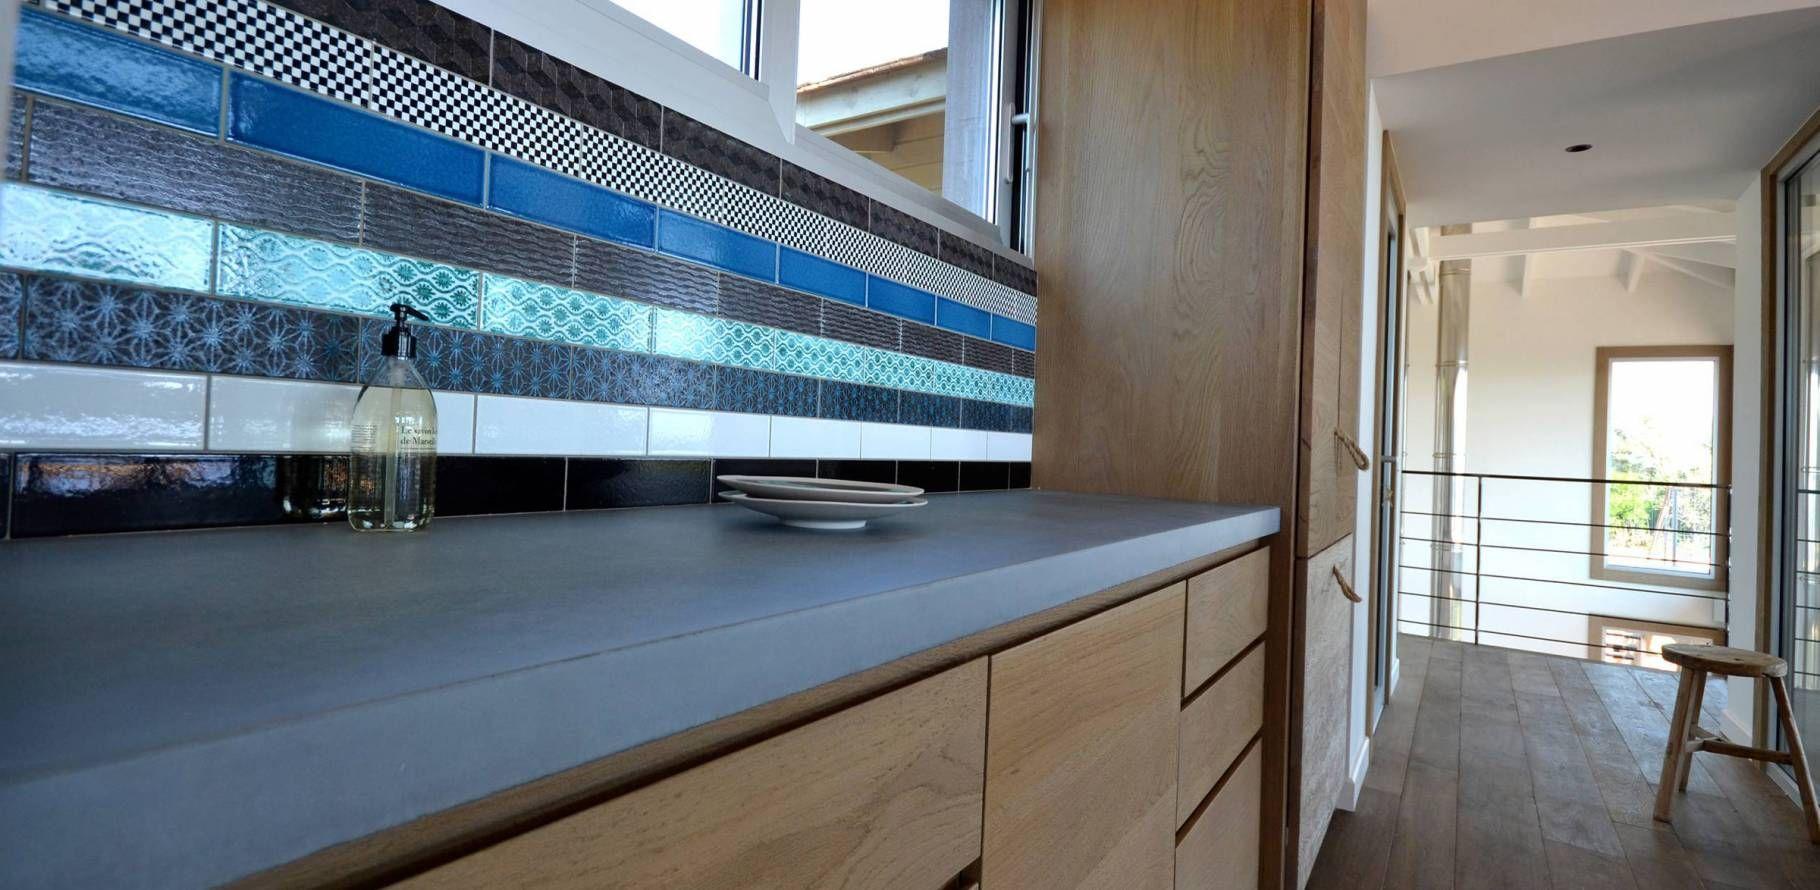 Spérone - Kitchen nook with concrete worktop | Concrete bespoke ...